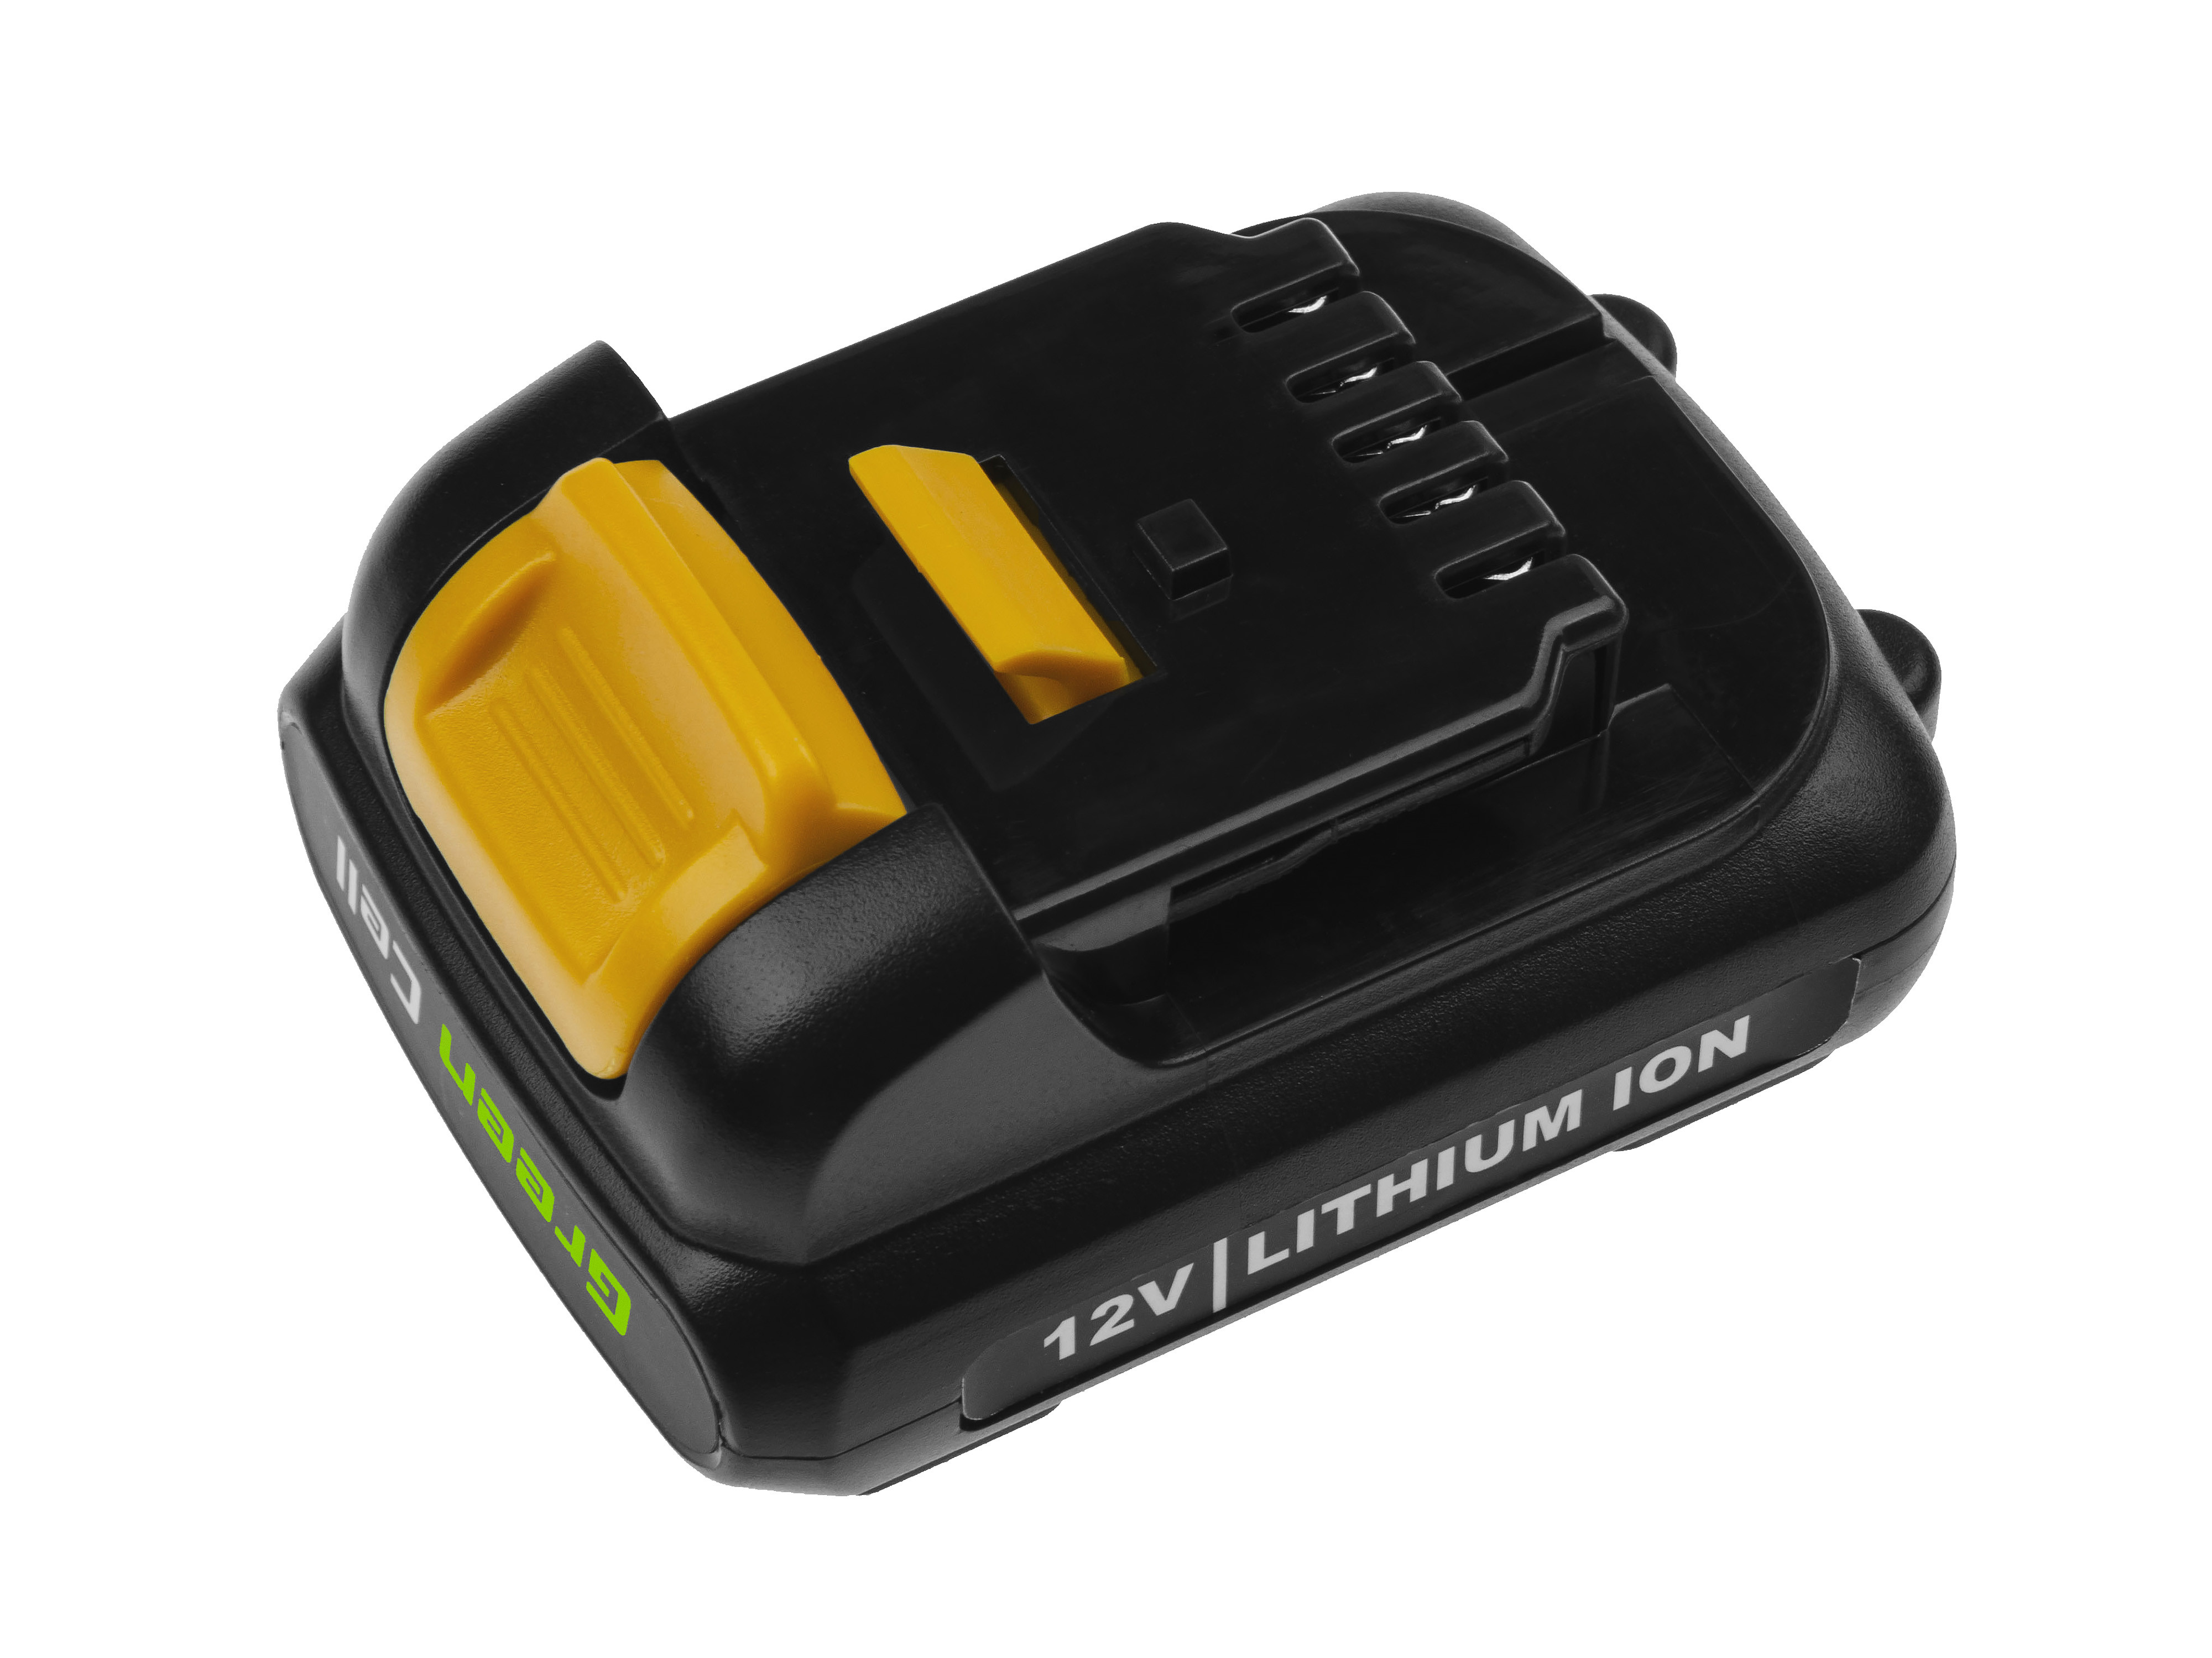 Power Tools Battery DCB180 for Dewalt DCD740 DCD780 DCD980 DCF620 DCF880 DCN660 DCS350 DCS380